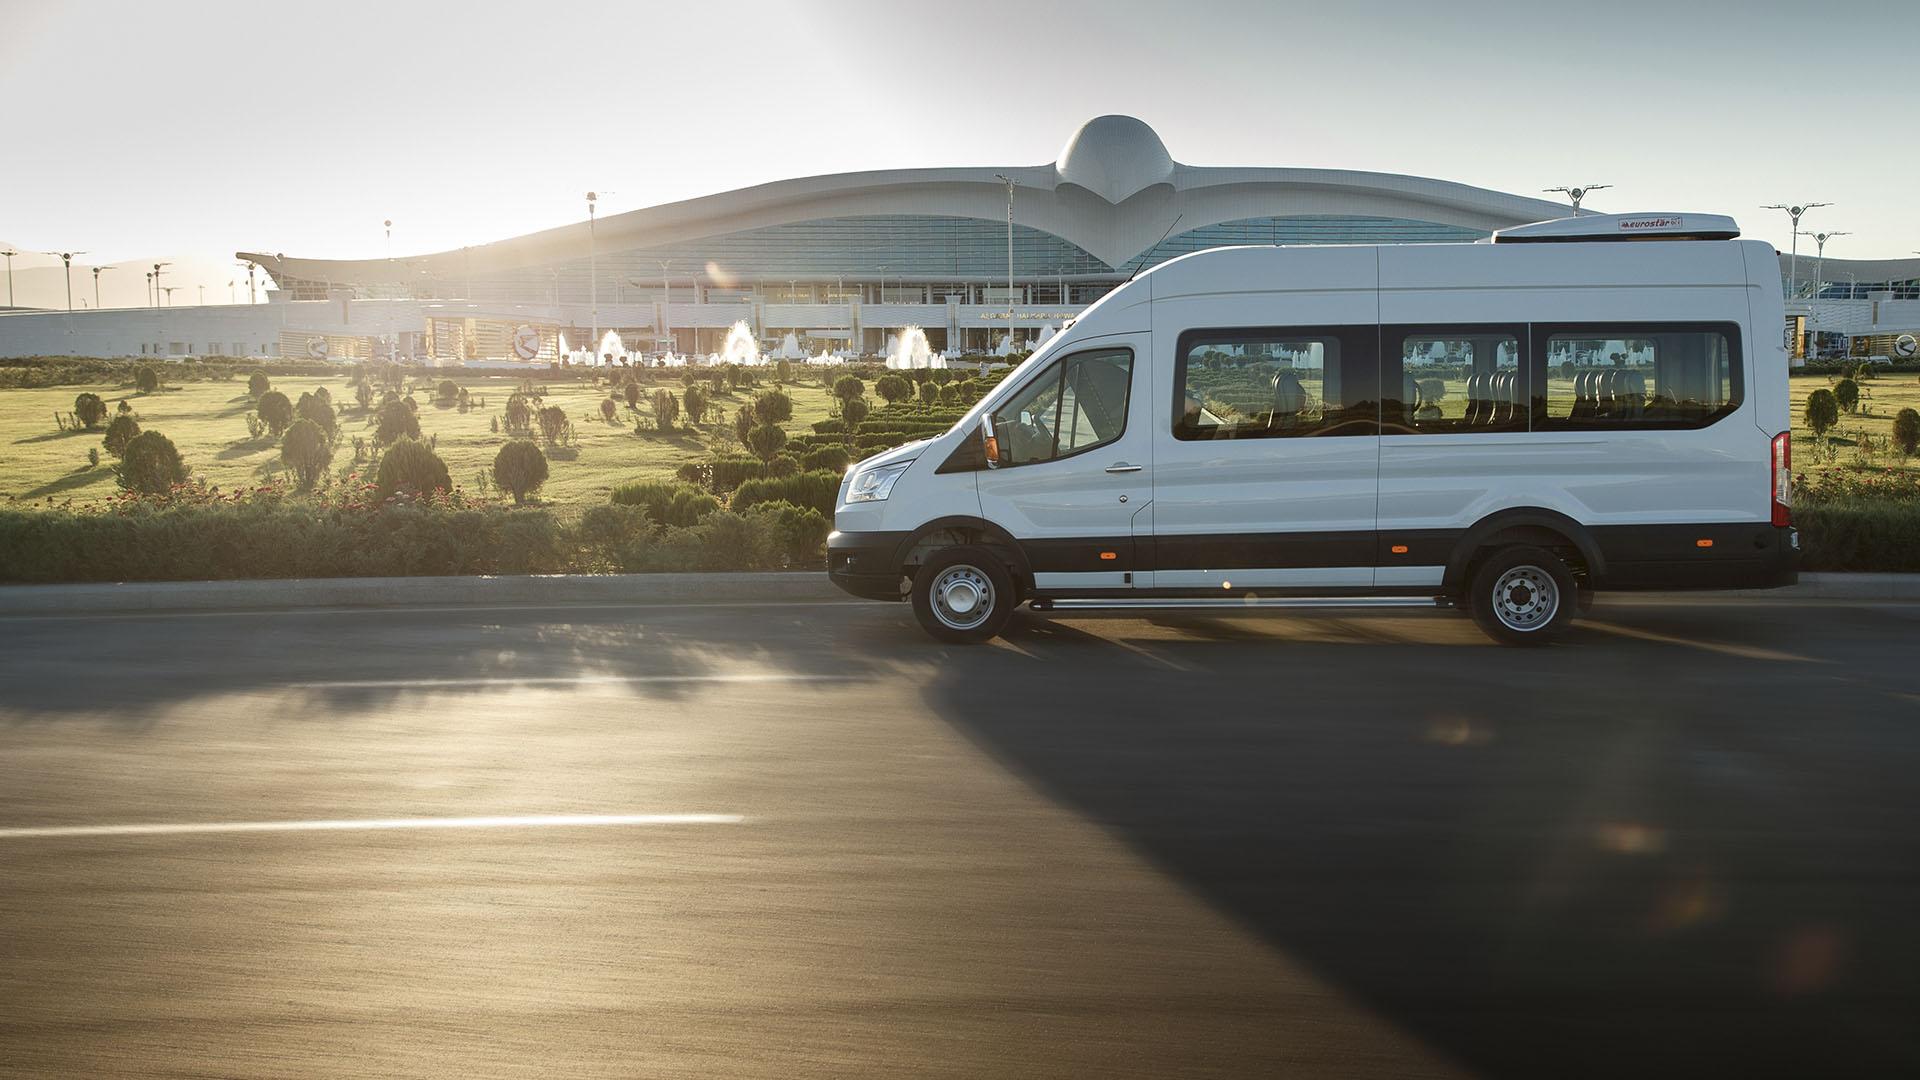 Автопарк DN Tours, туристическое агенство, аренда автомобиля Туркменистан (3)